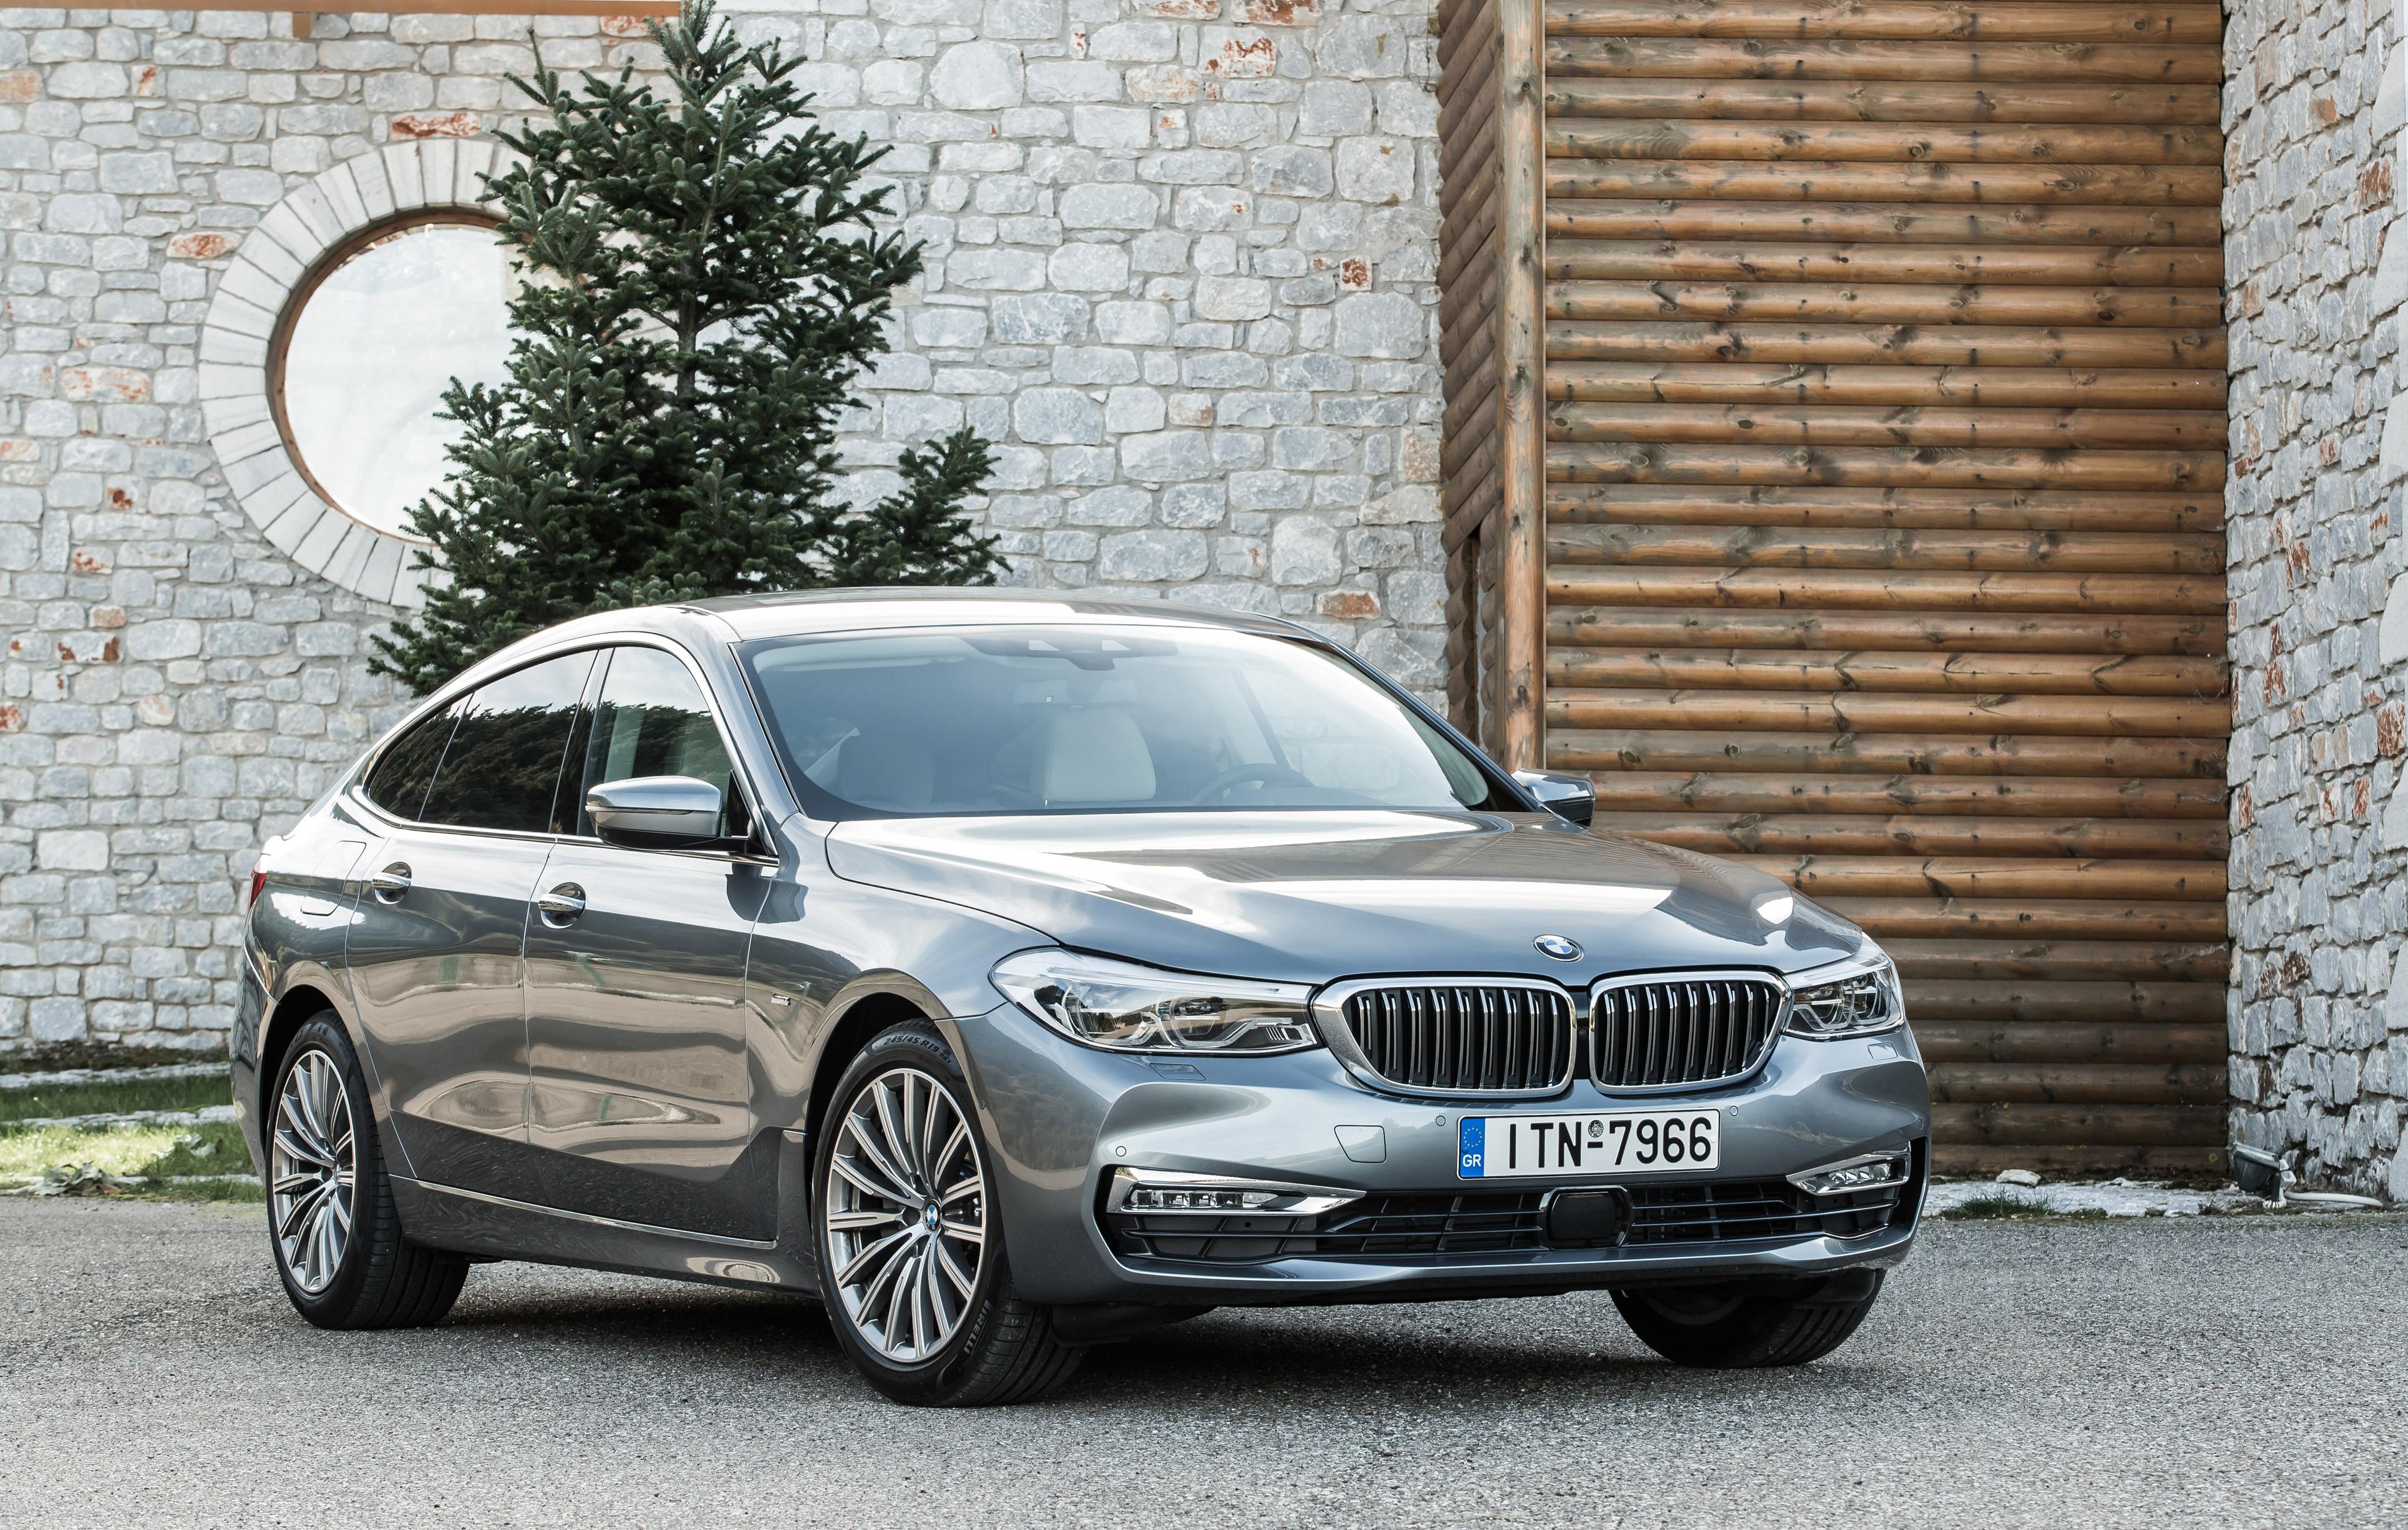 2018 BMW 630i Gran Turismo Luxury Line (G32) wallpaper ...